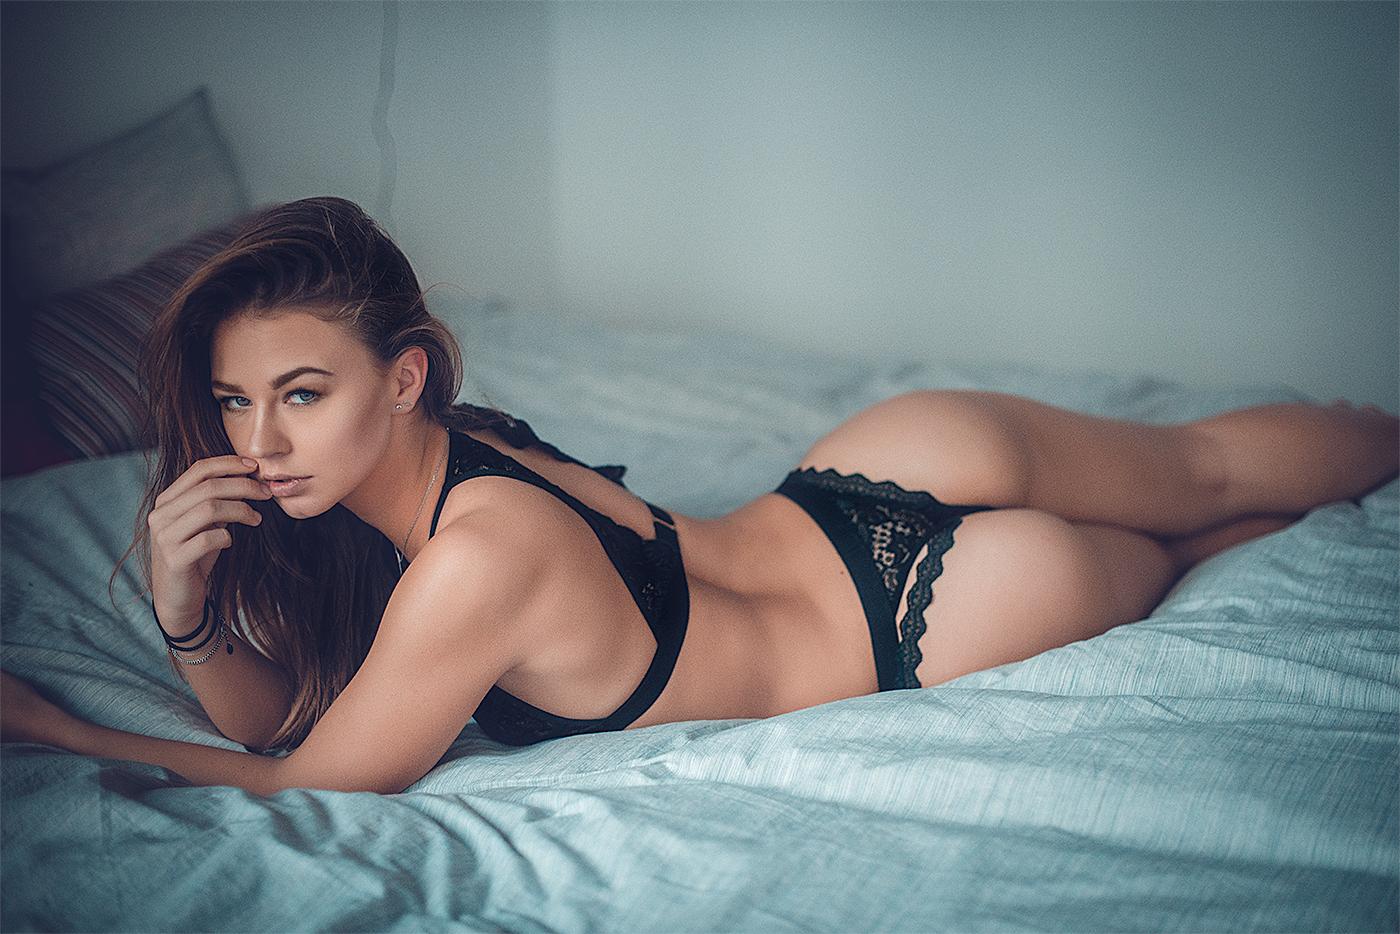 Laury Women    // lionsmag.com - premium nude photography magazine